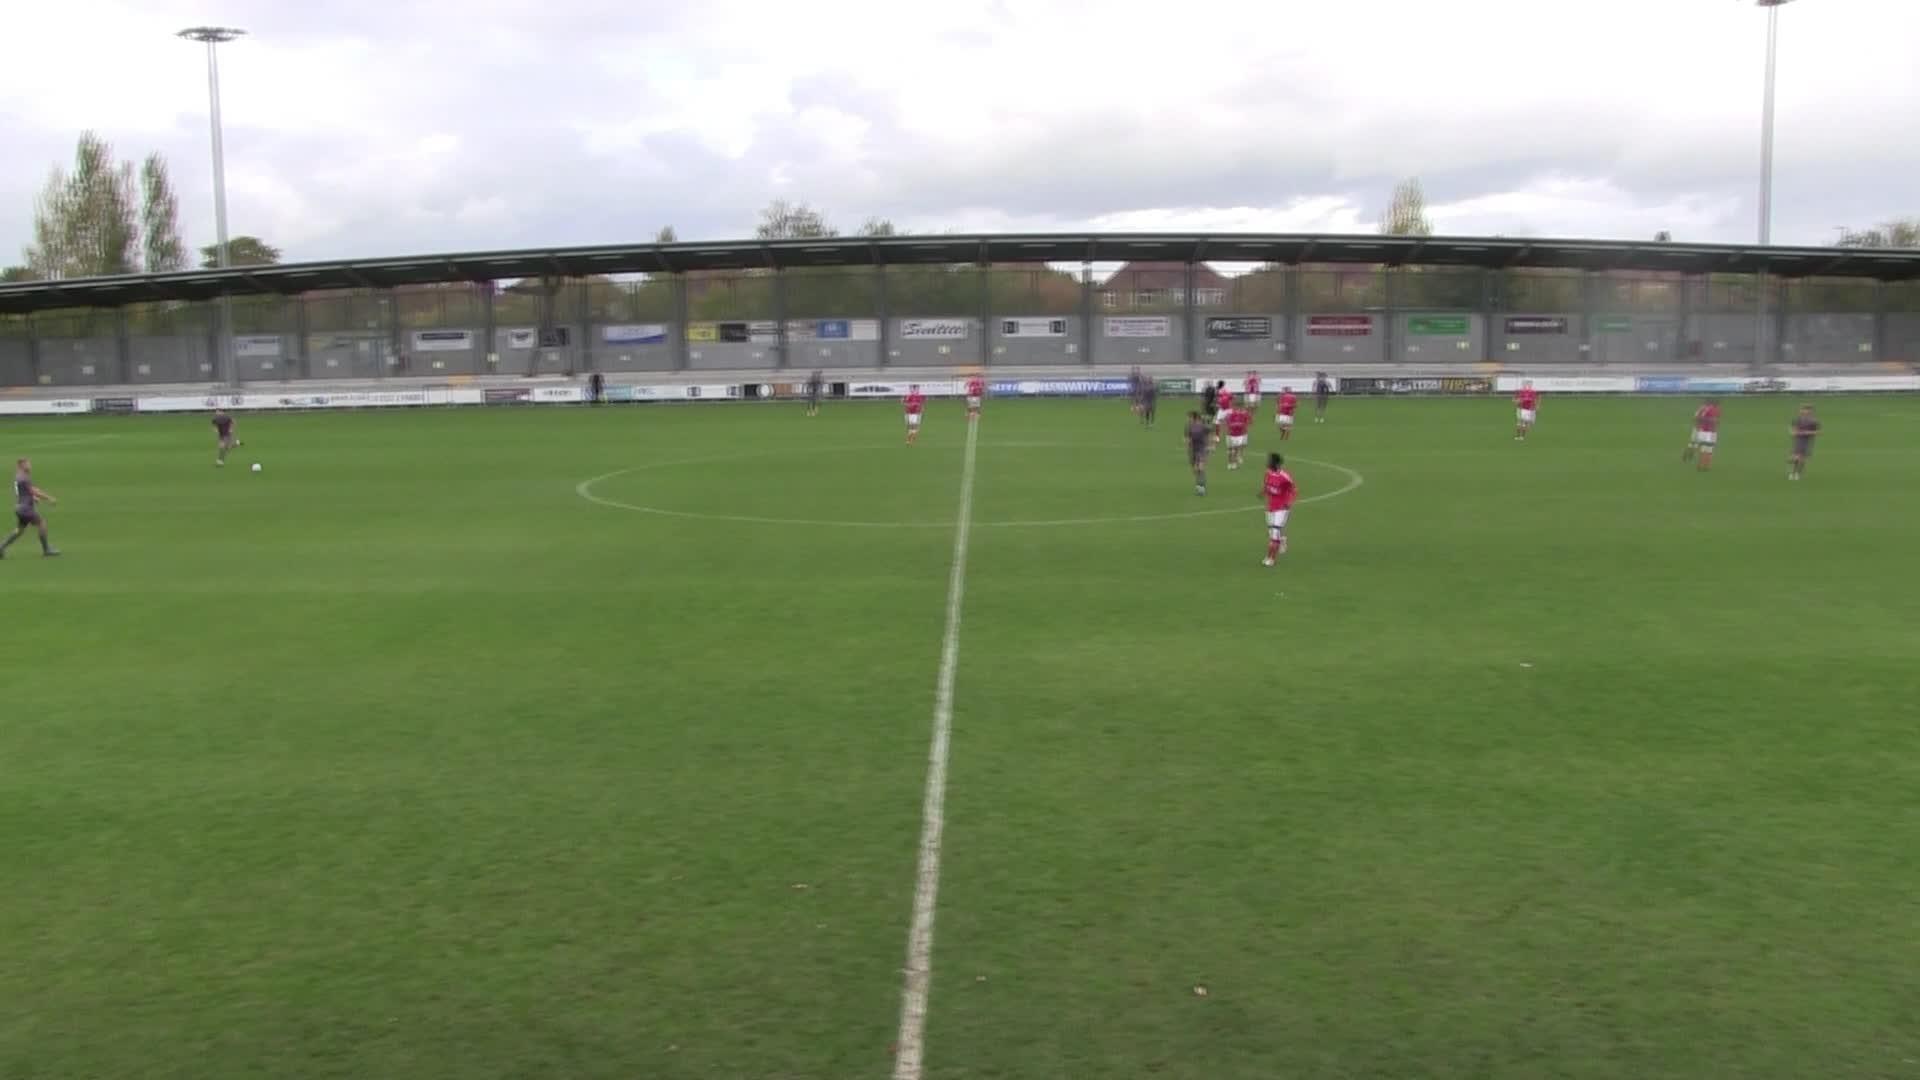 U23 Highlights | Charlton 3 Nottingham Forest 4 (October 2020)